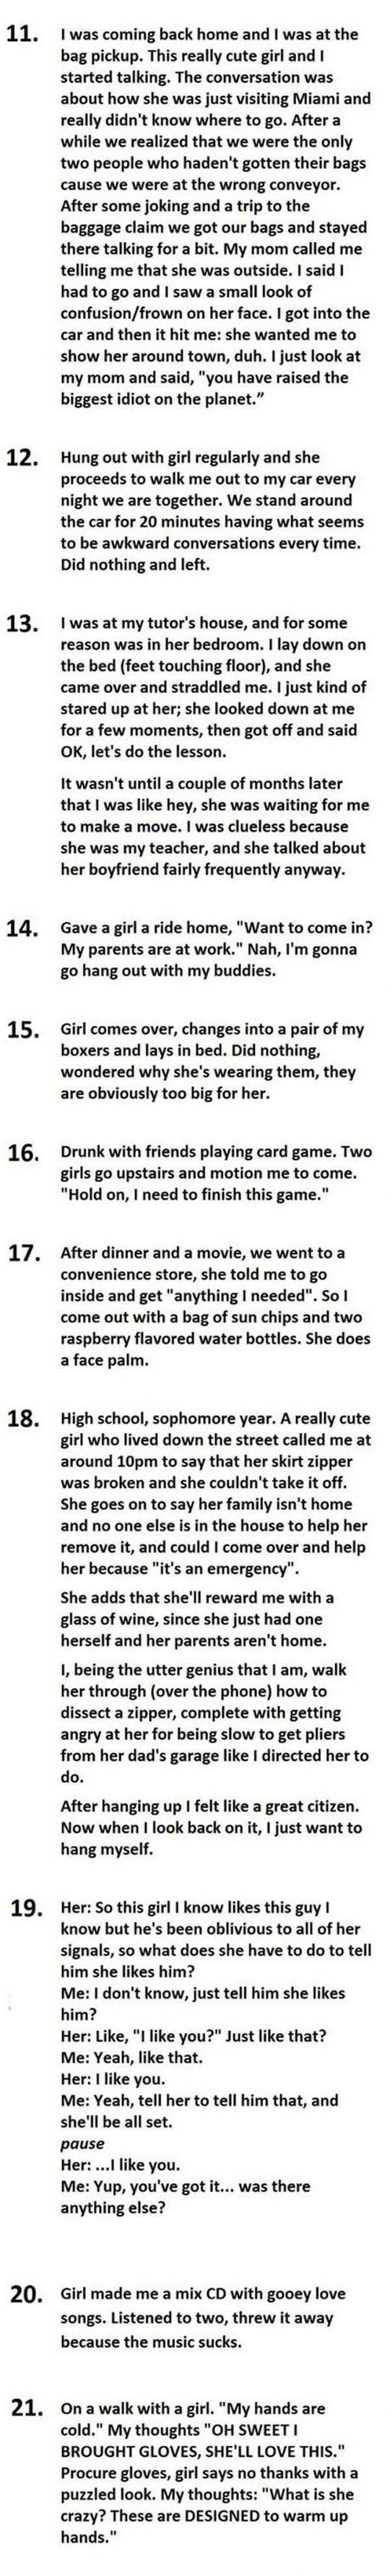 funny-girl-boys-single-list-story-responses